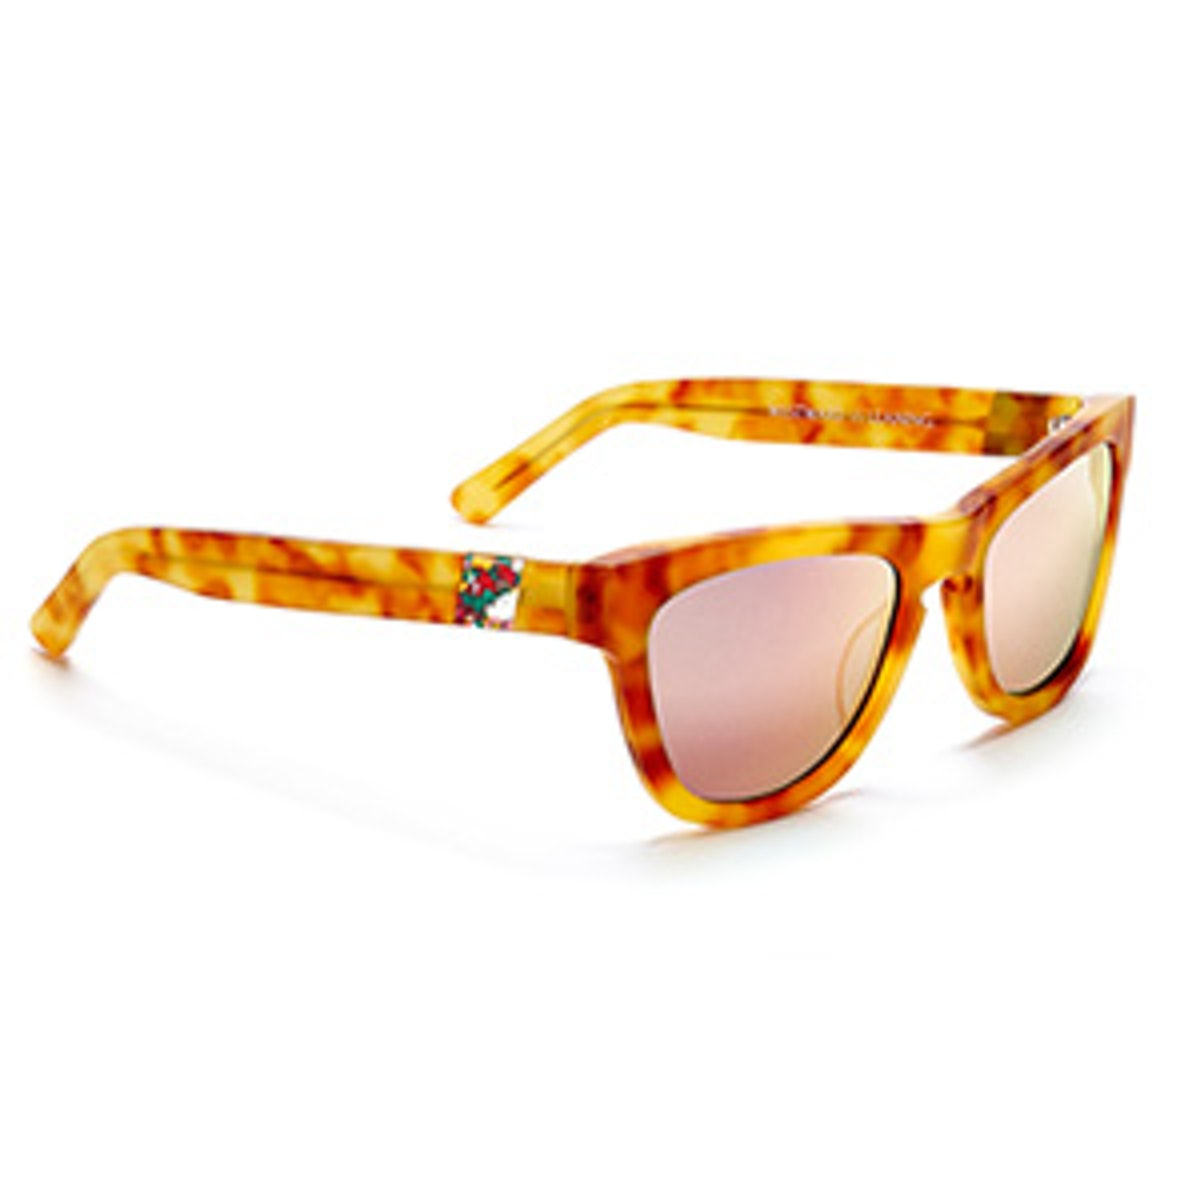 Pioneer 23 Sunglasses